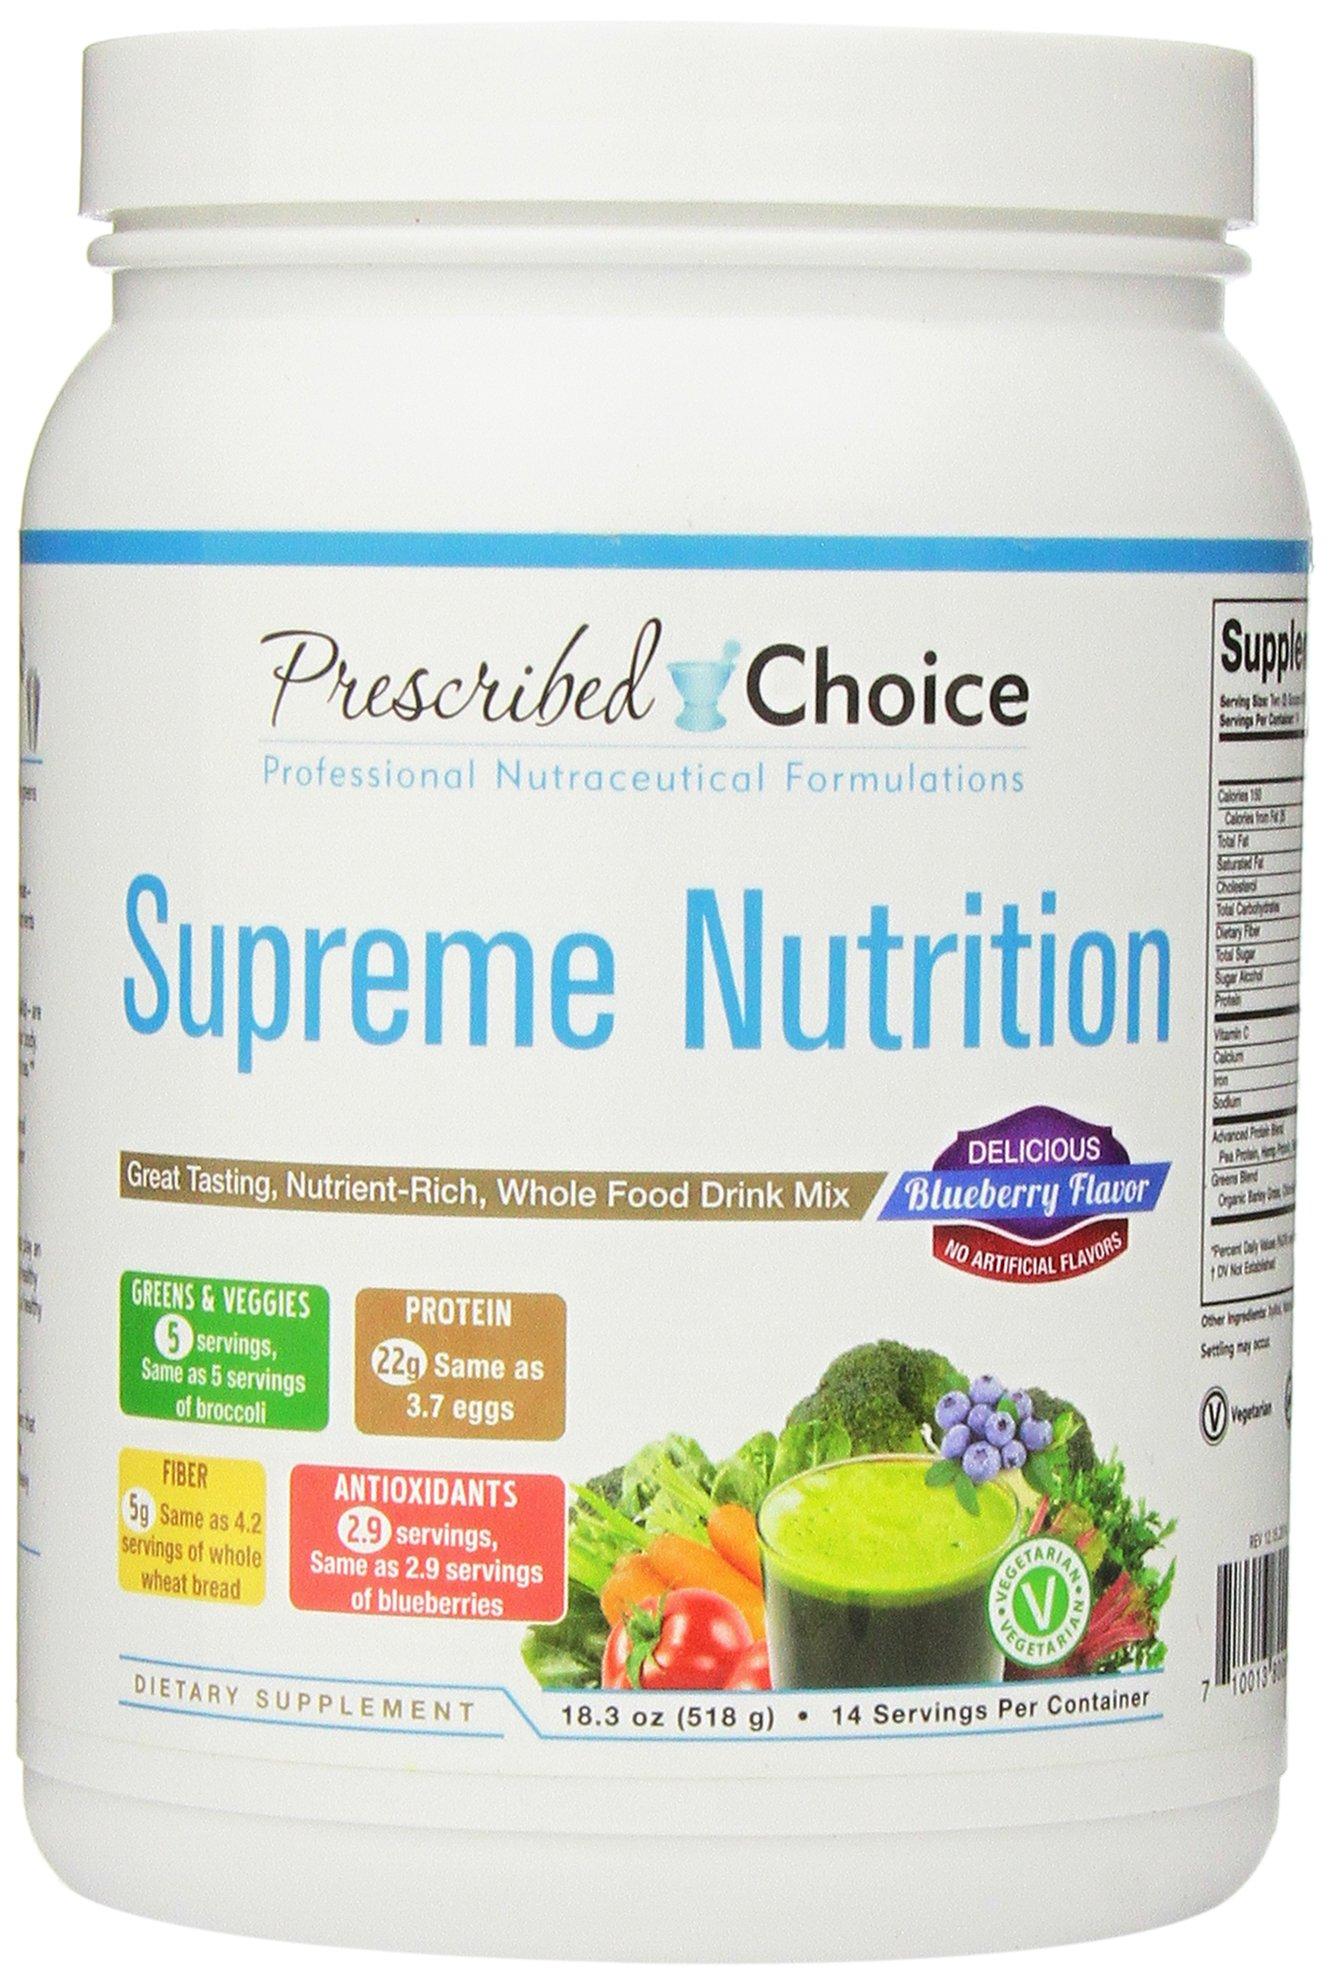 Prescribed Choice Supreme Nutrition, 518 Gram